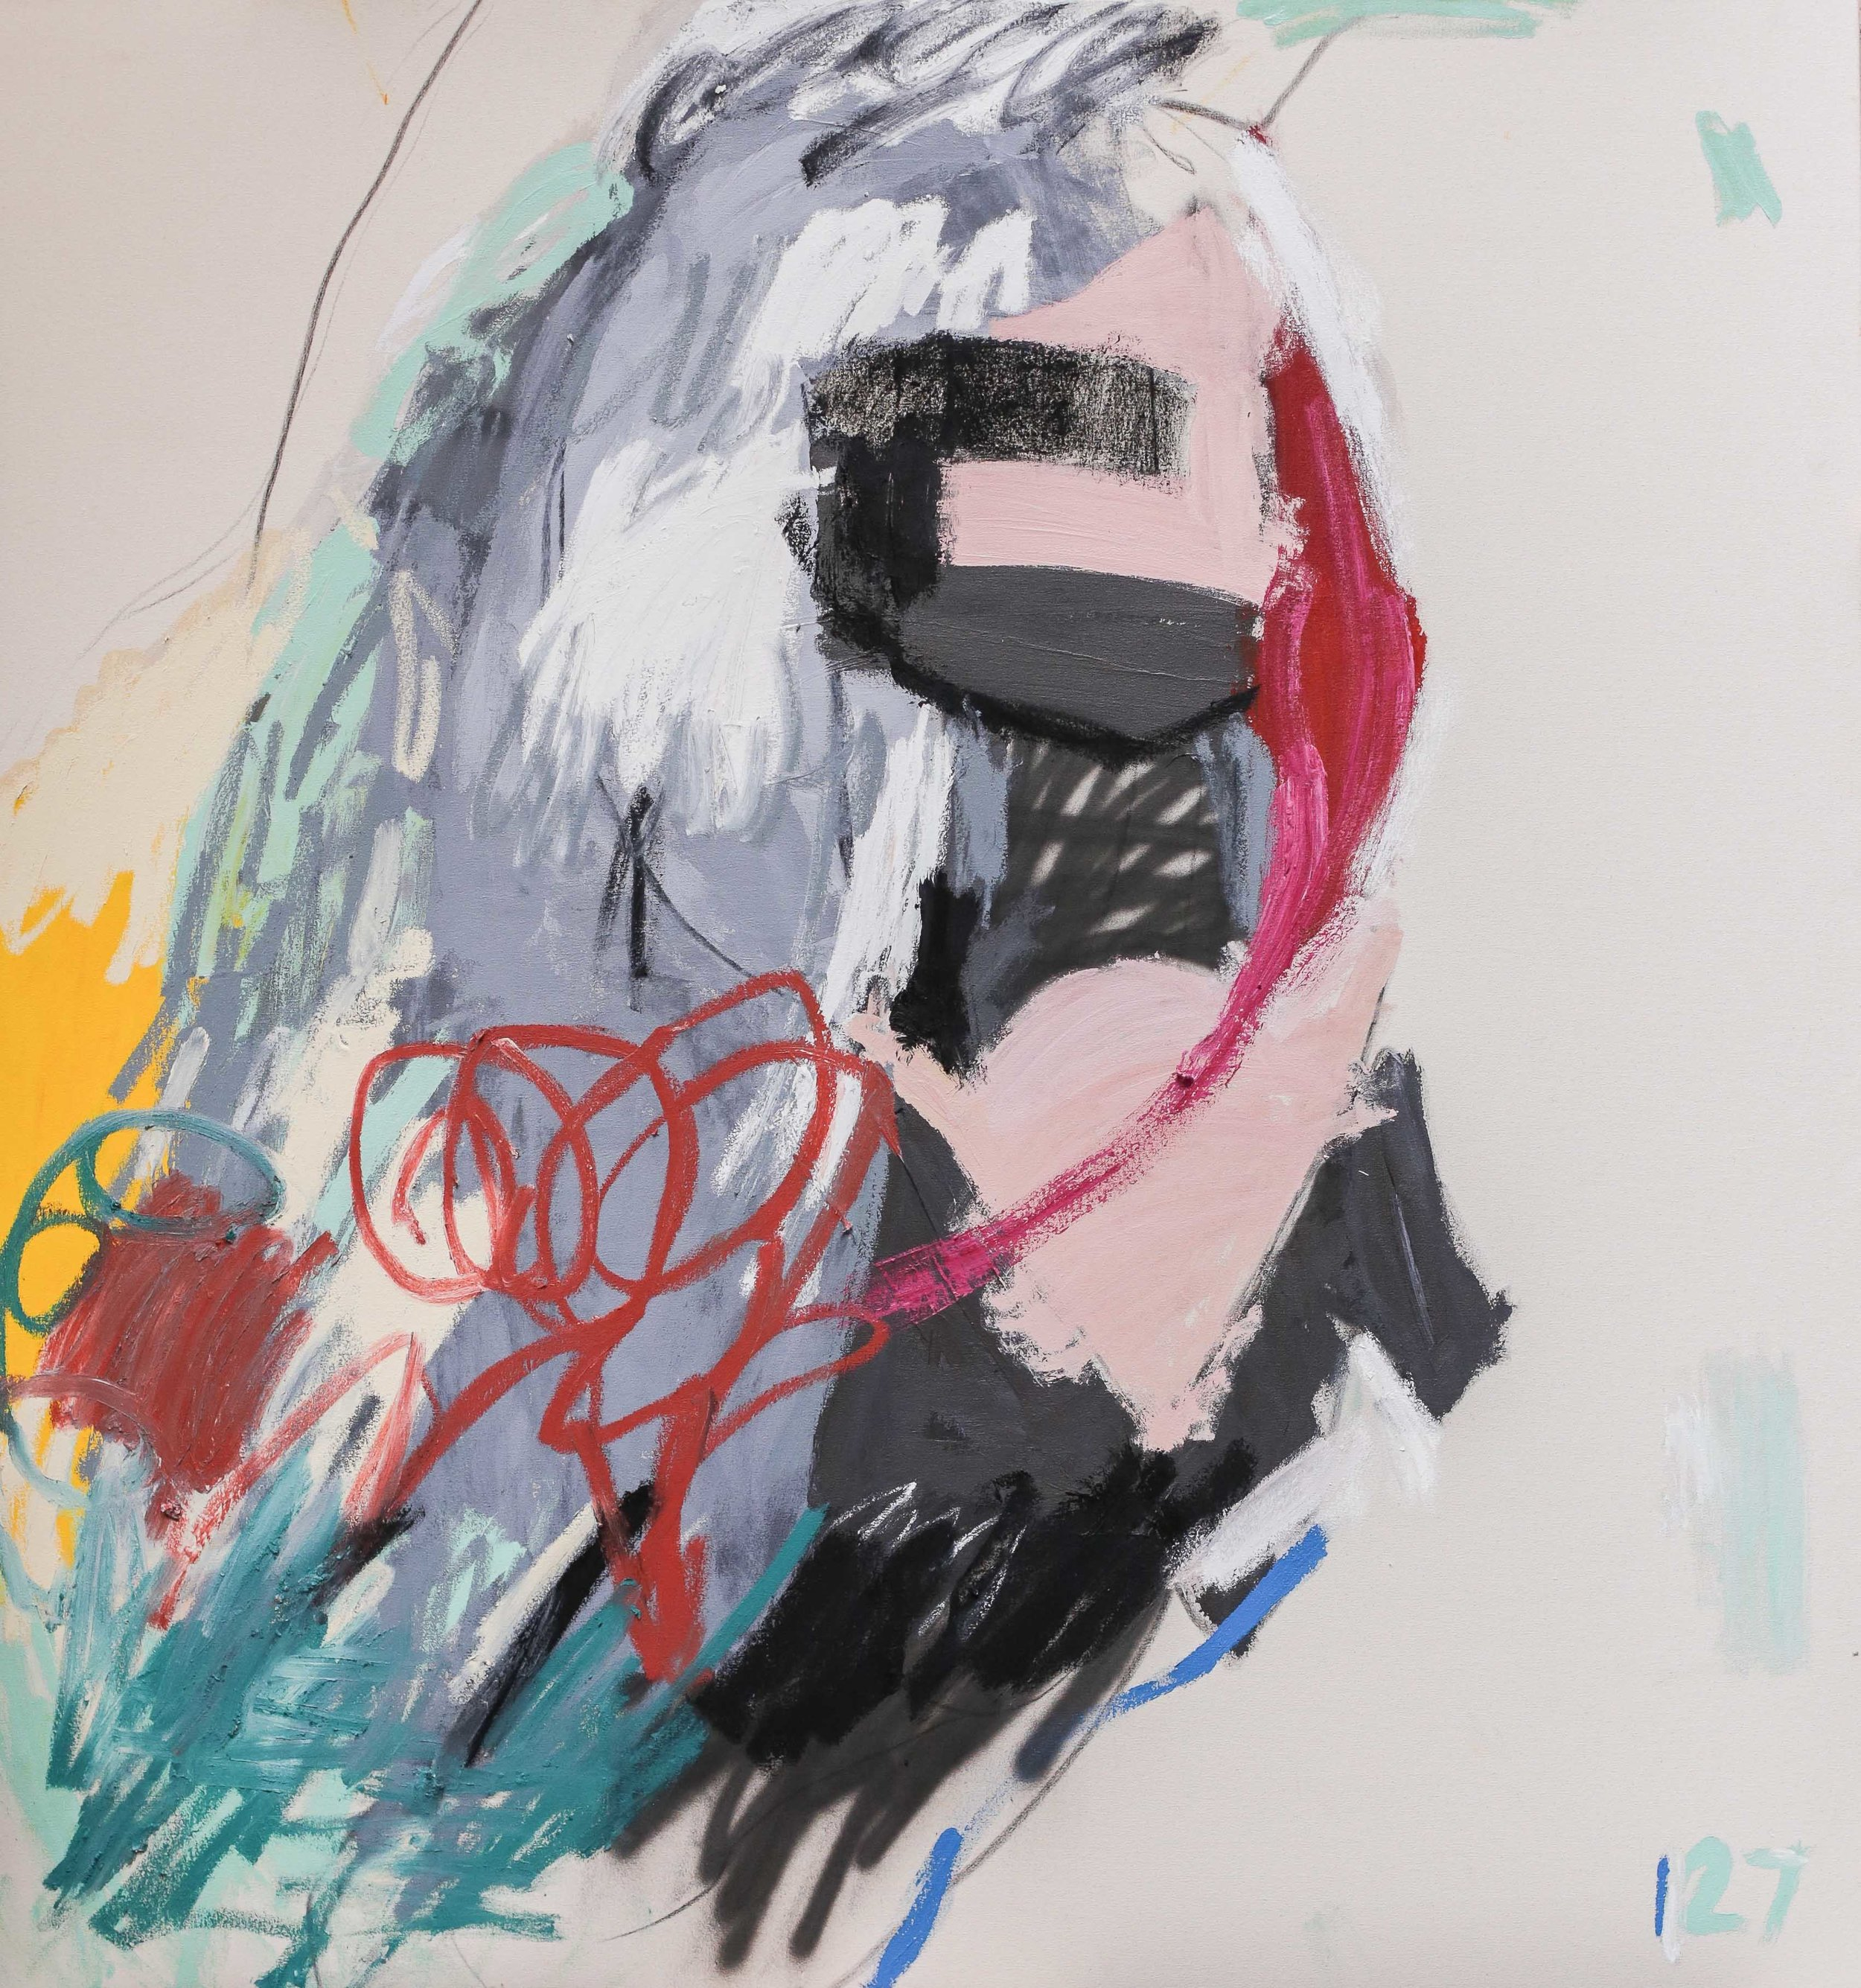 "Twenty Seven ,spray paint, acrylic paint, oil stick and charcoal on canvas, 64"" x 60"", 2017"